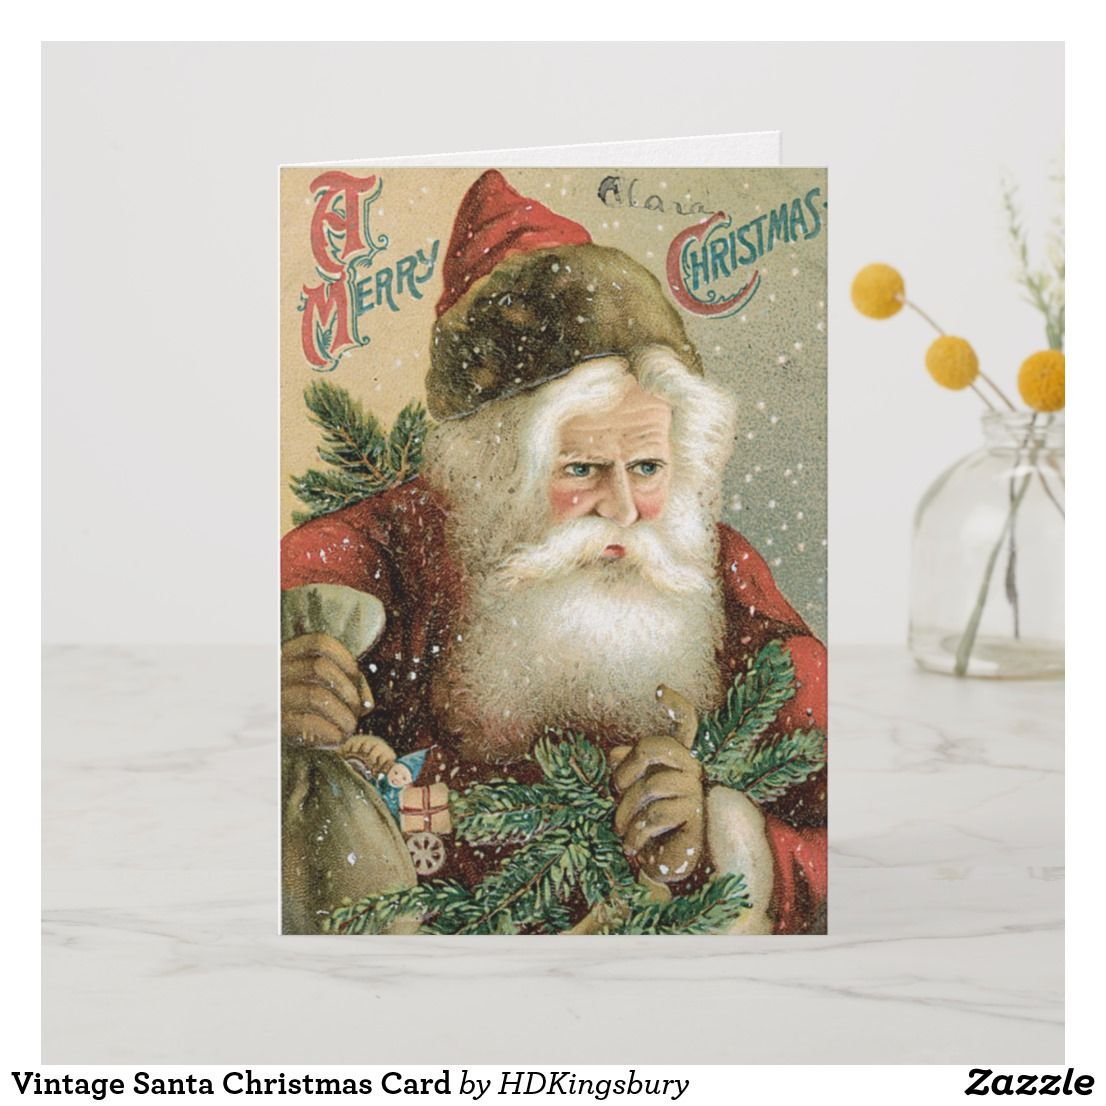 Vintage Santa Christmas Card For Sale Vintagechristmas Santa